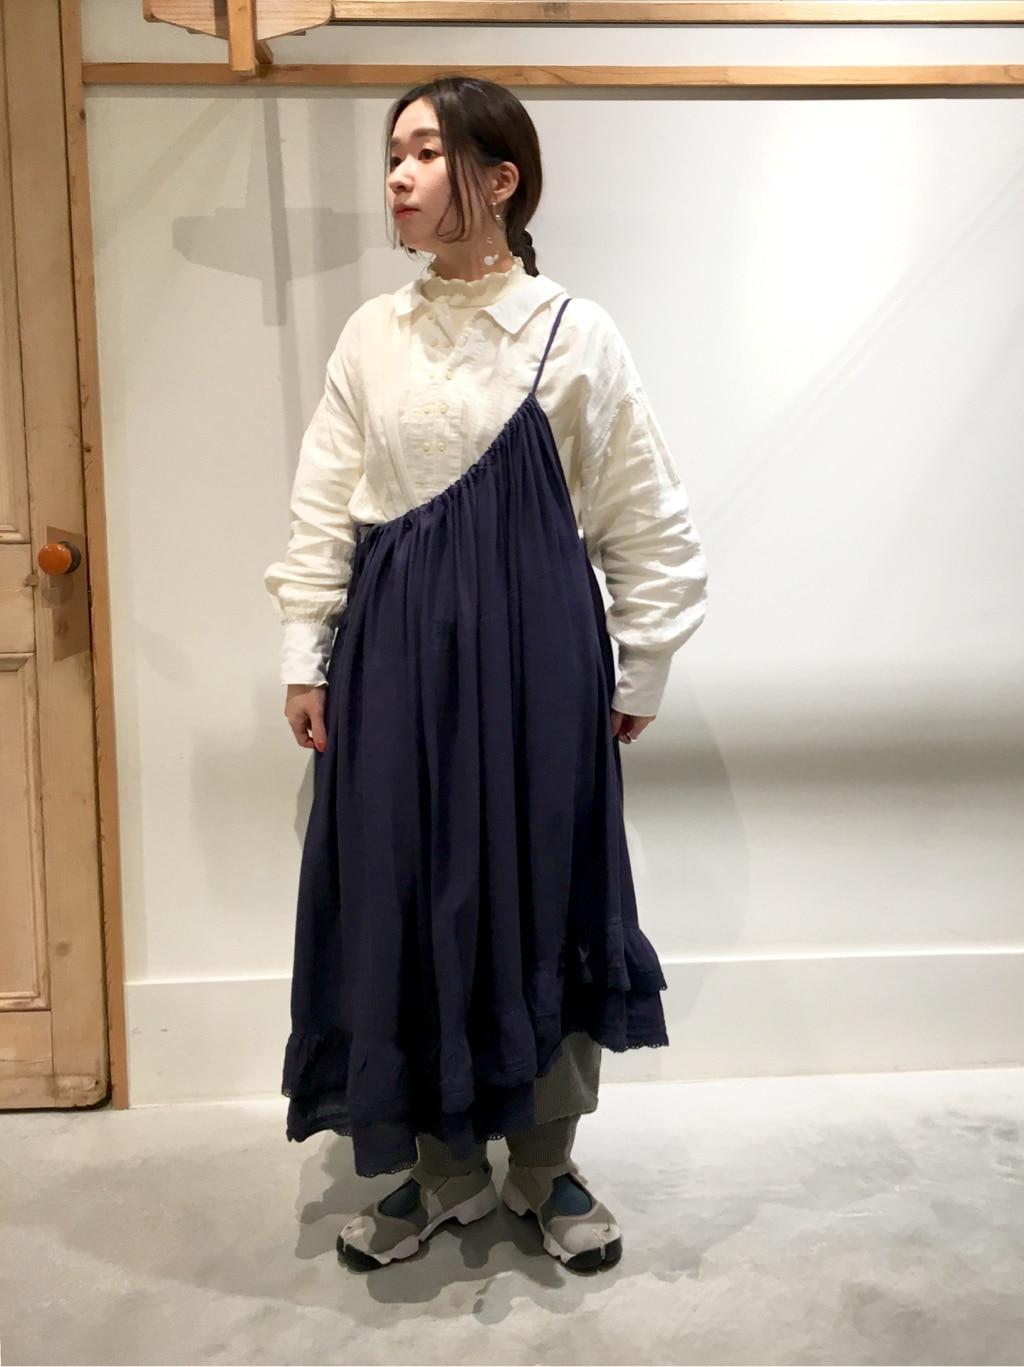 Malle chambre de charme 調布パルコ 身長:152cm 2020.10.23